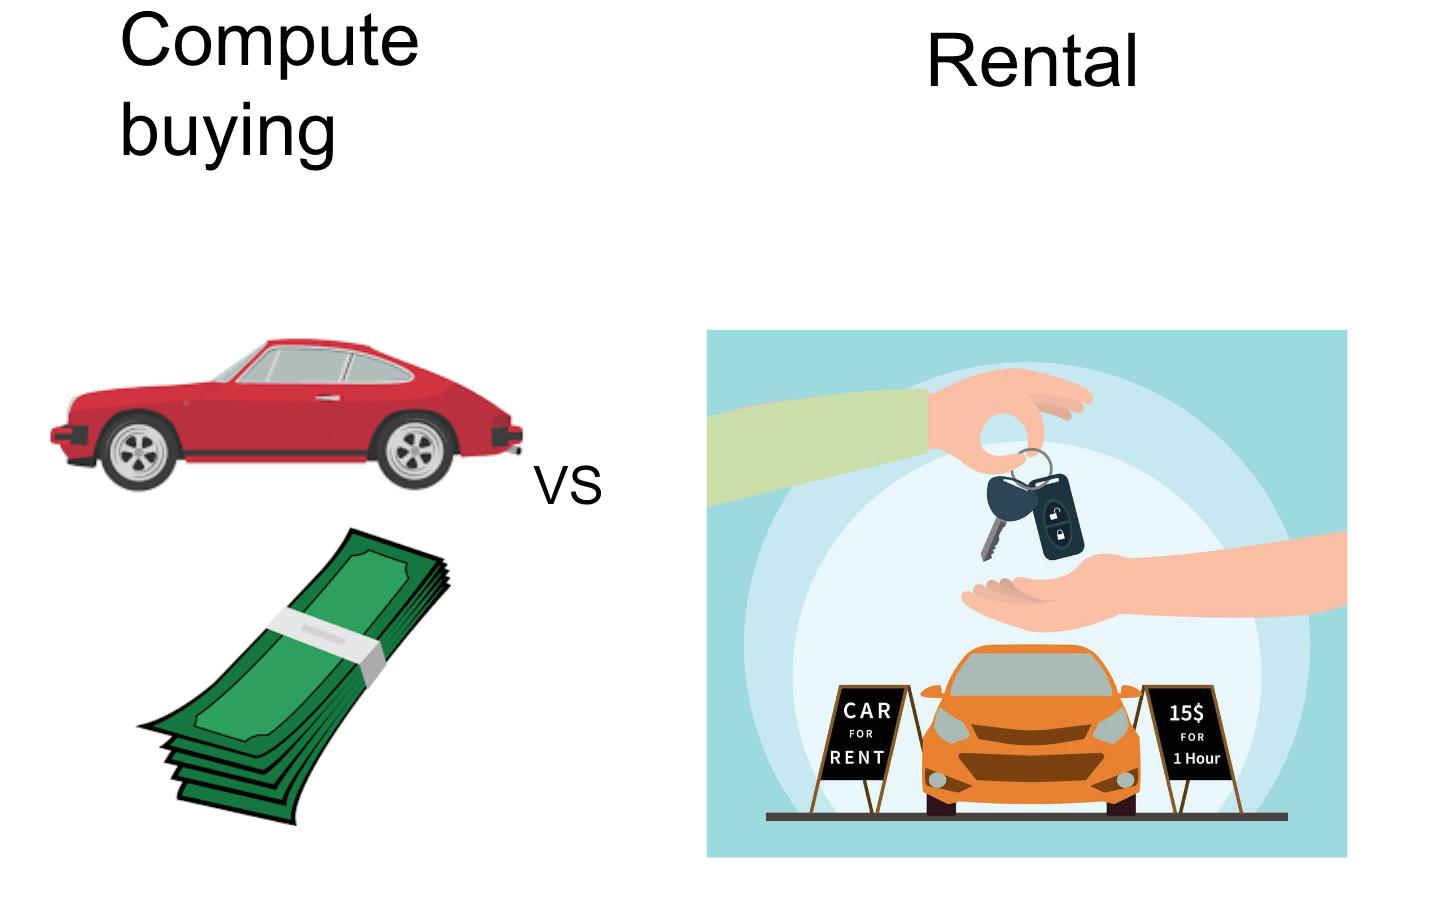 rent vs buy a car - Parfu kaptanband co